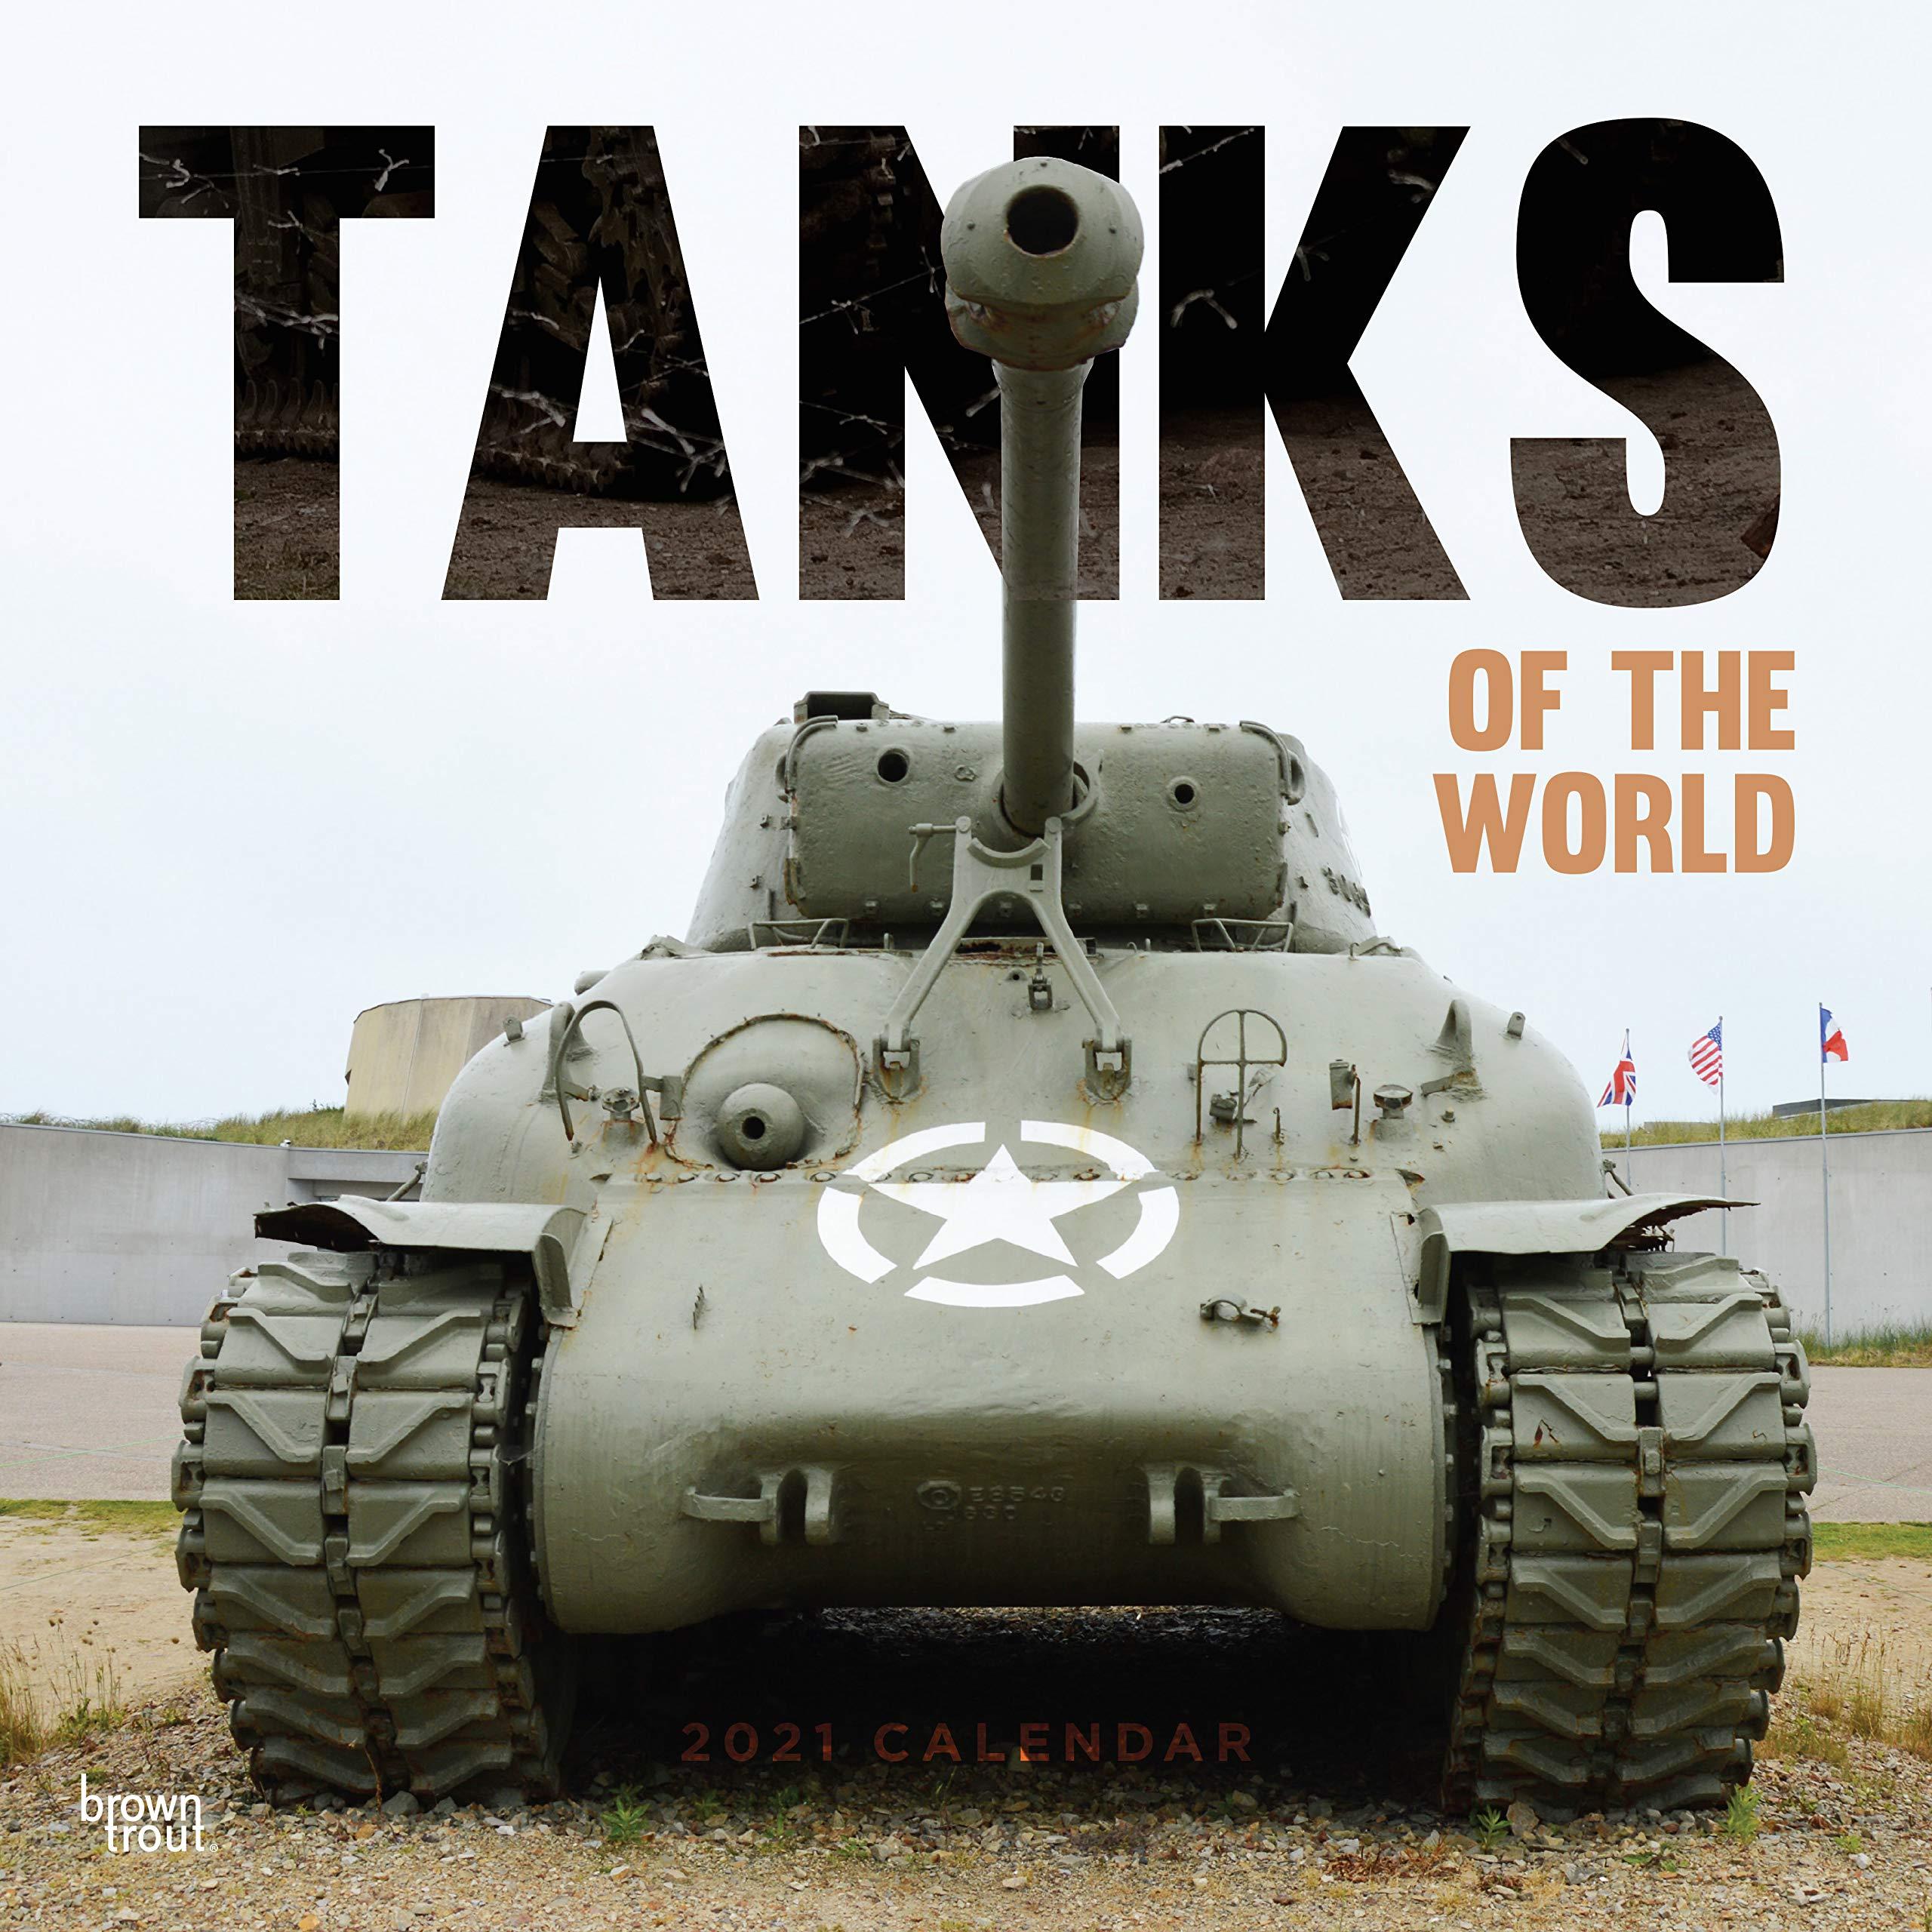 World Of Tanks Calendar 2021 Tanks of the World 2021 Square Wall Calendar: Amazon.co.uk